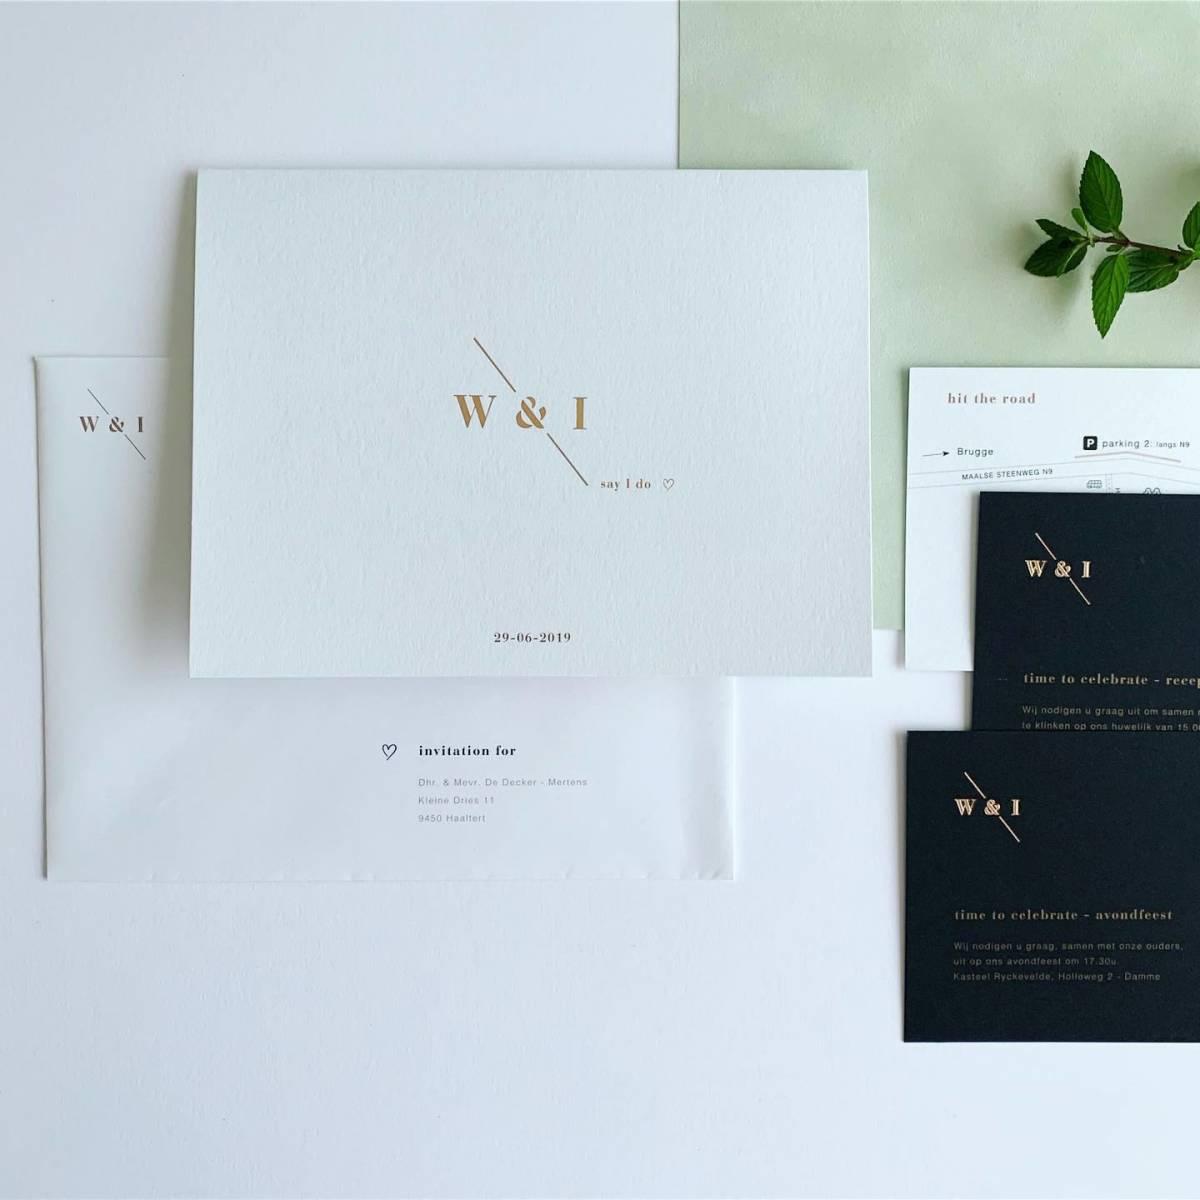 Scarabar - Trouwuitnodiging - Huwelijksuitnodiging - Drukwerk - Huwelijk - Trouw - Bruiloft - House of Weddings - 9